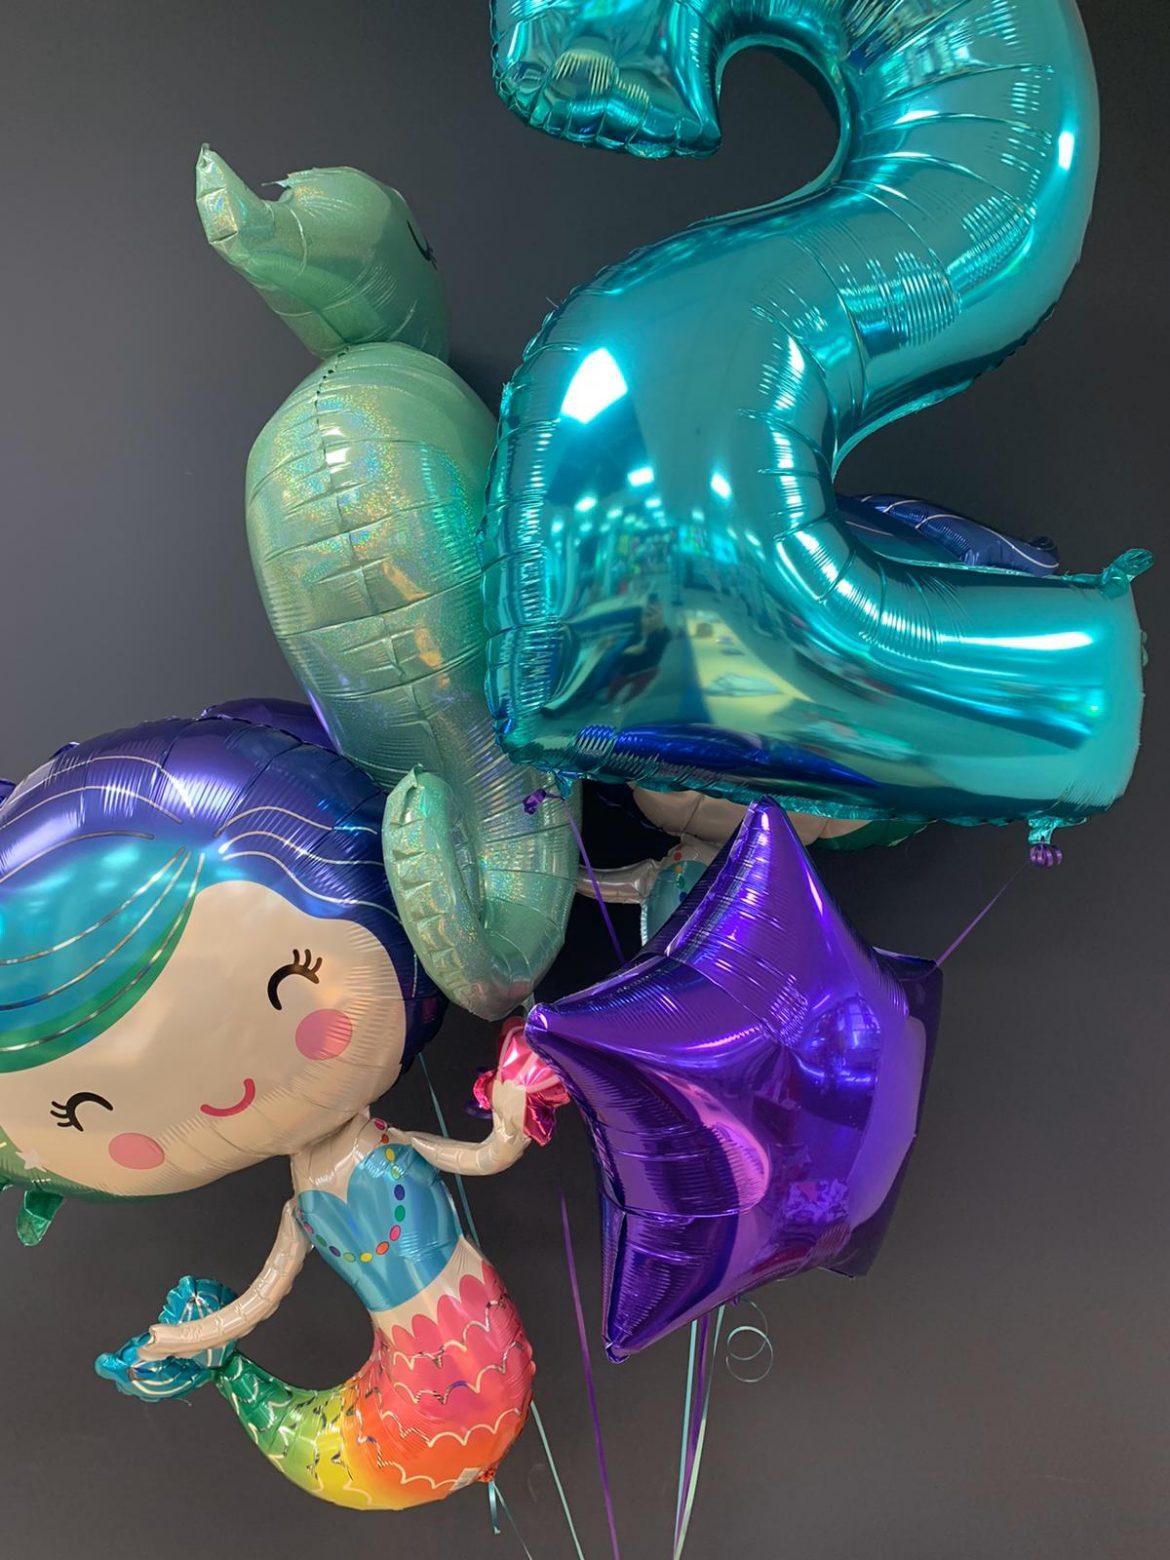 Zahl 2 mit Heliumballons € 9,90 und Meerjungfrau € 7,90 1